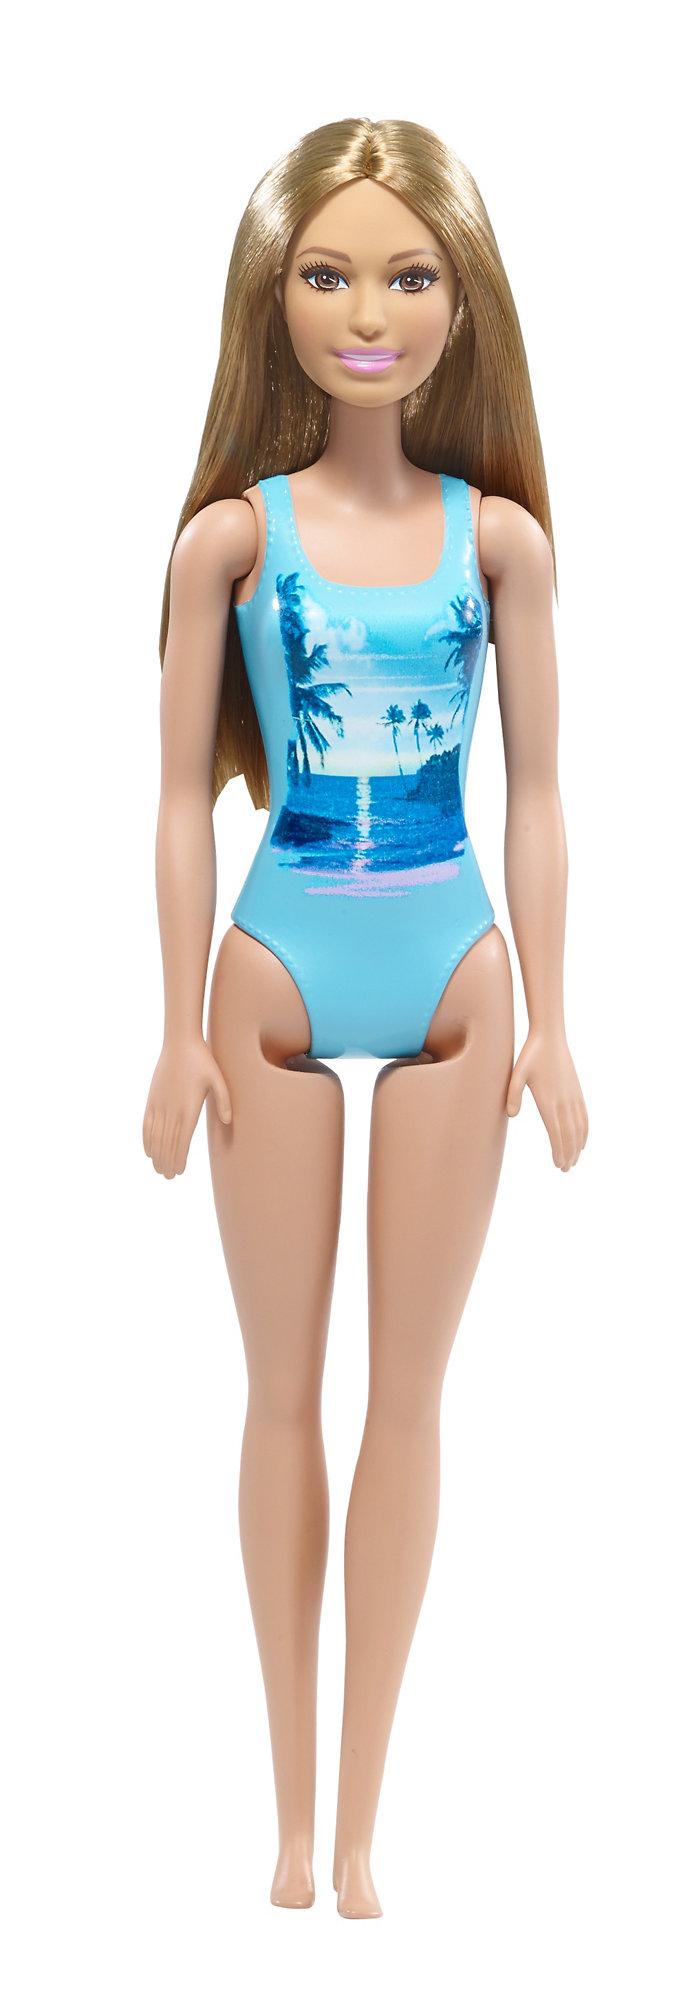 Barbie Beach Summer Doll by Mattel